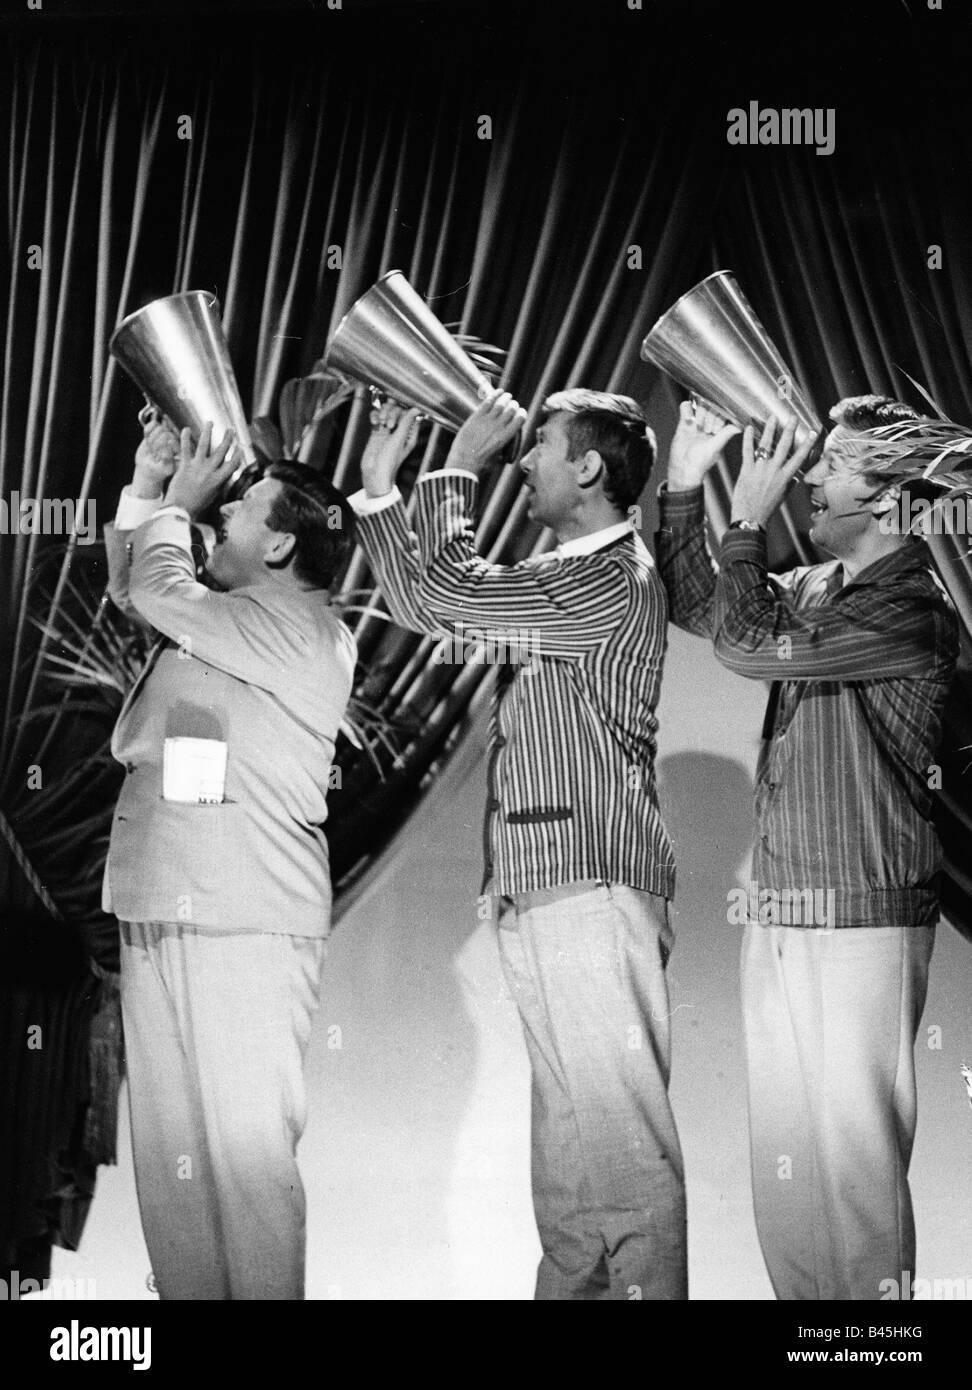 Band Bavarian performance group have